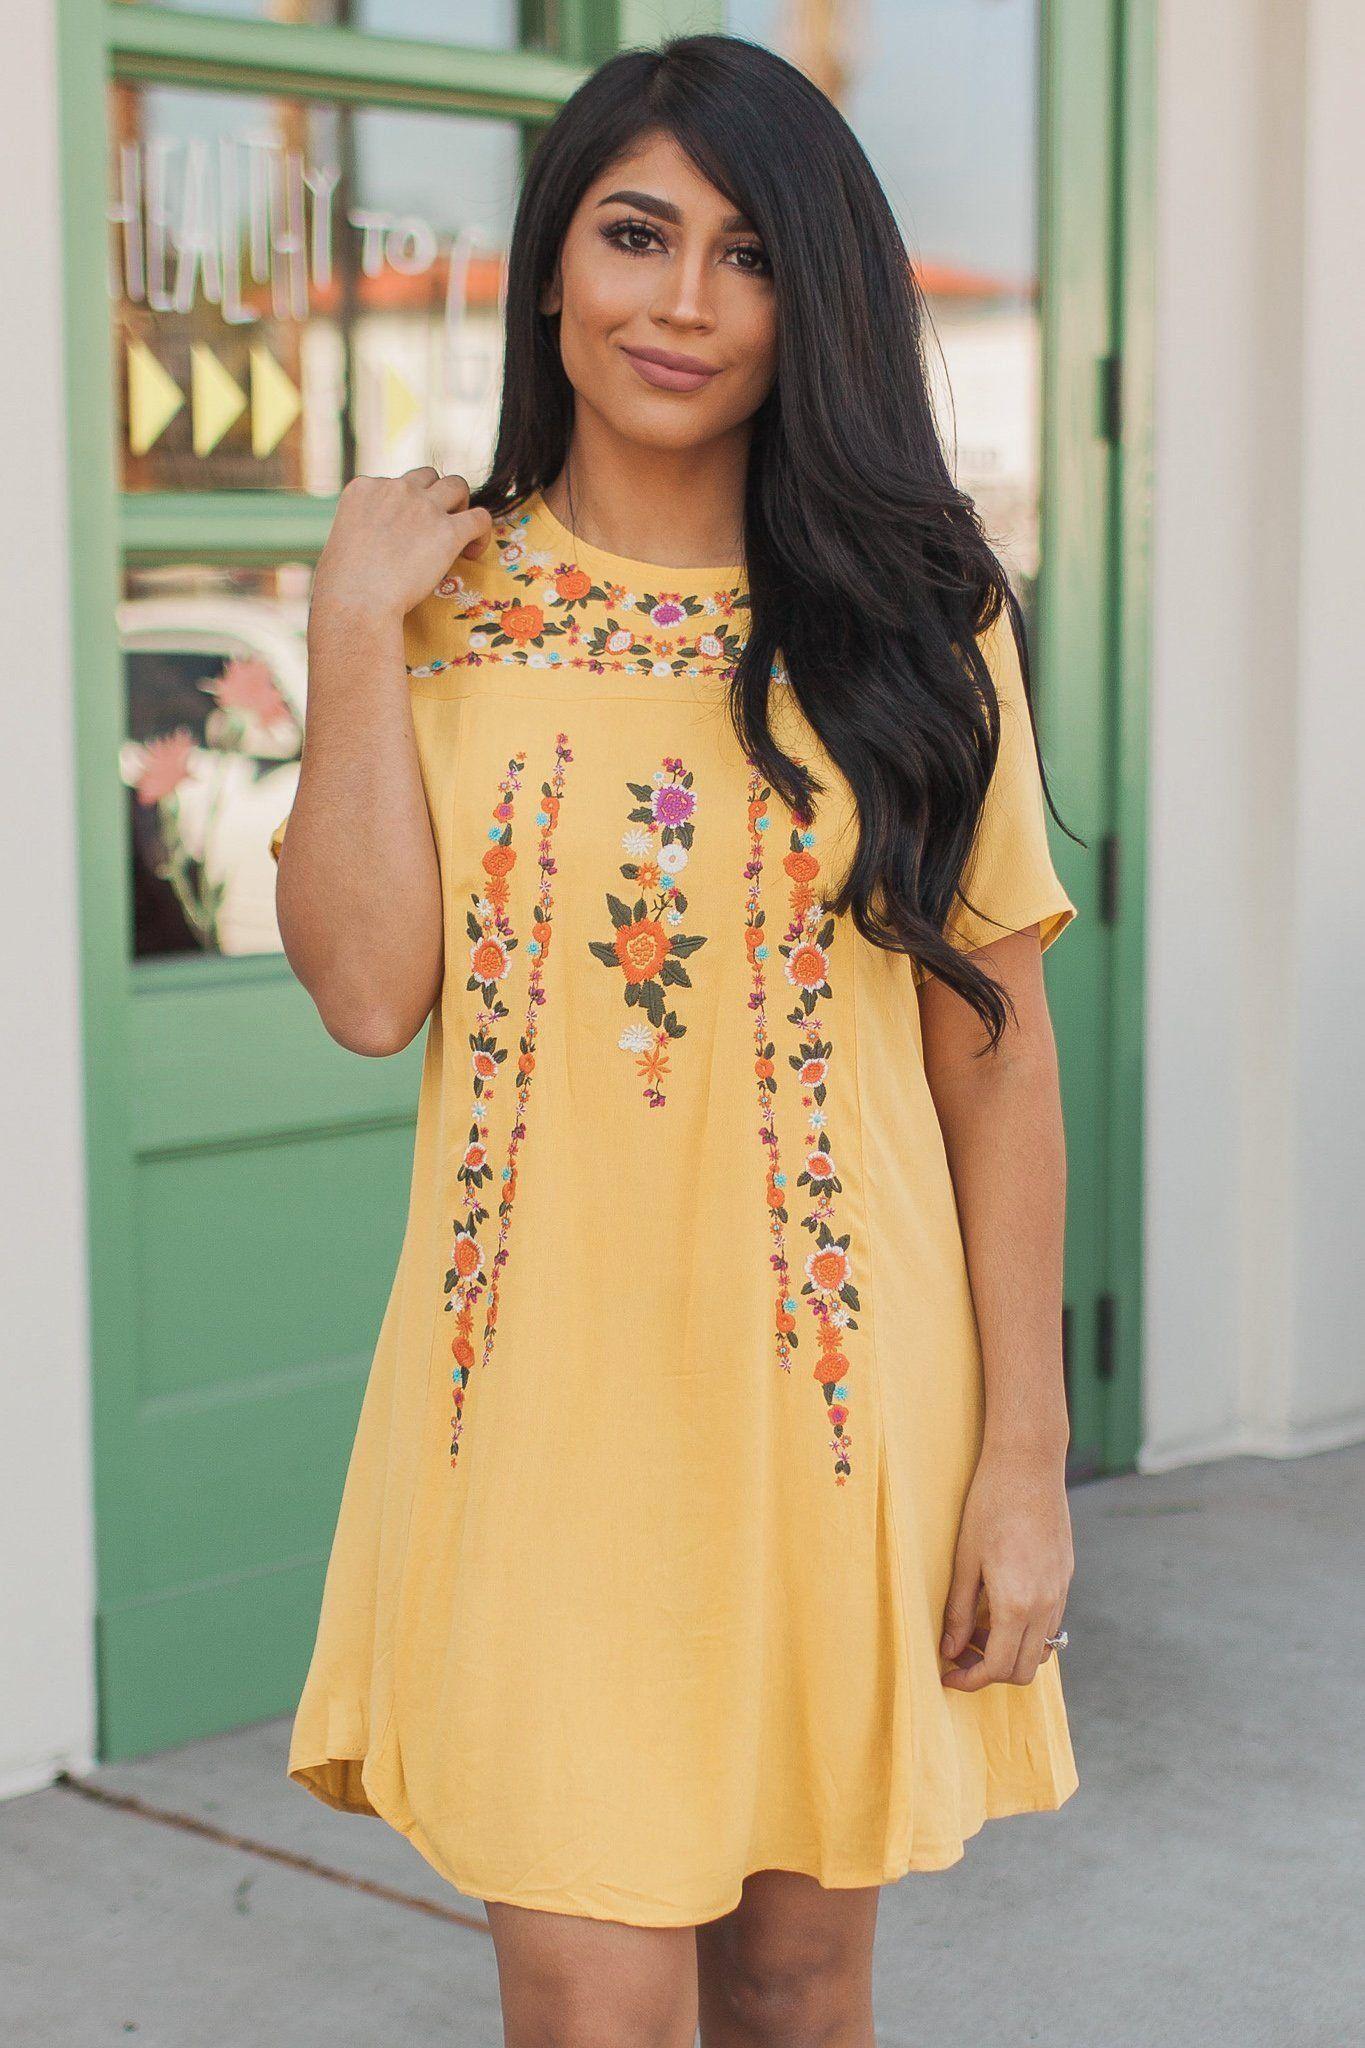 Feeling So Vibrant Shift Dress Yellow 1000 Mexican Style Dresses Dresses Shift Dress [ 2048 x 1365 Pixel ]